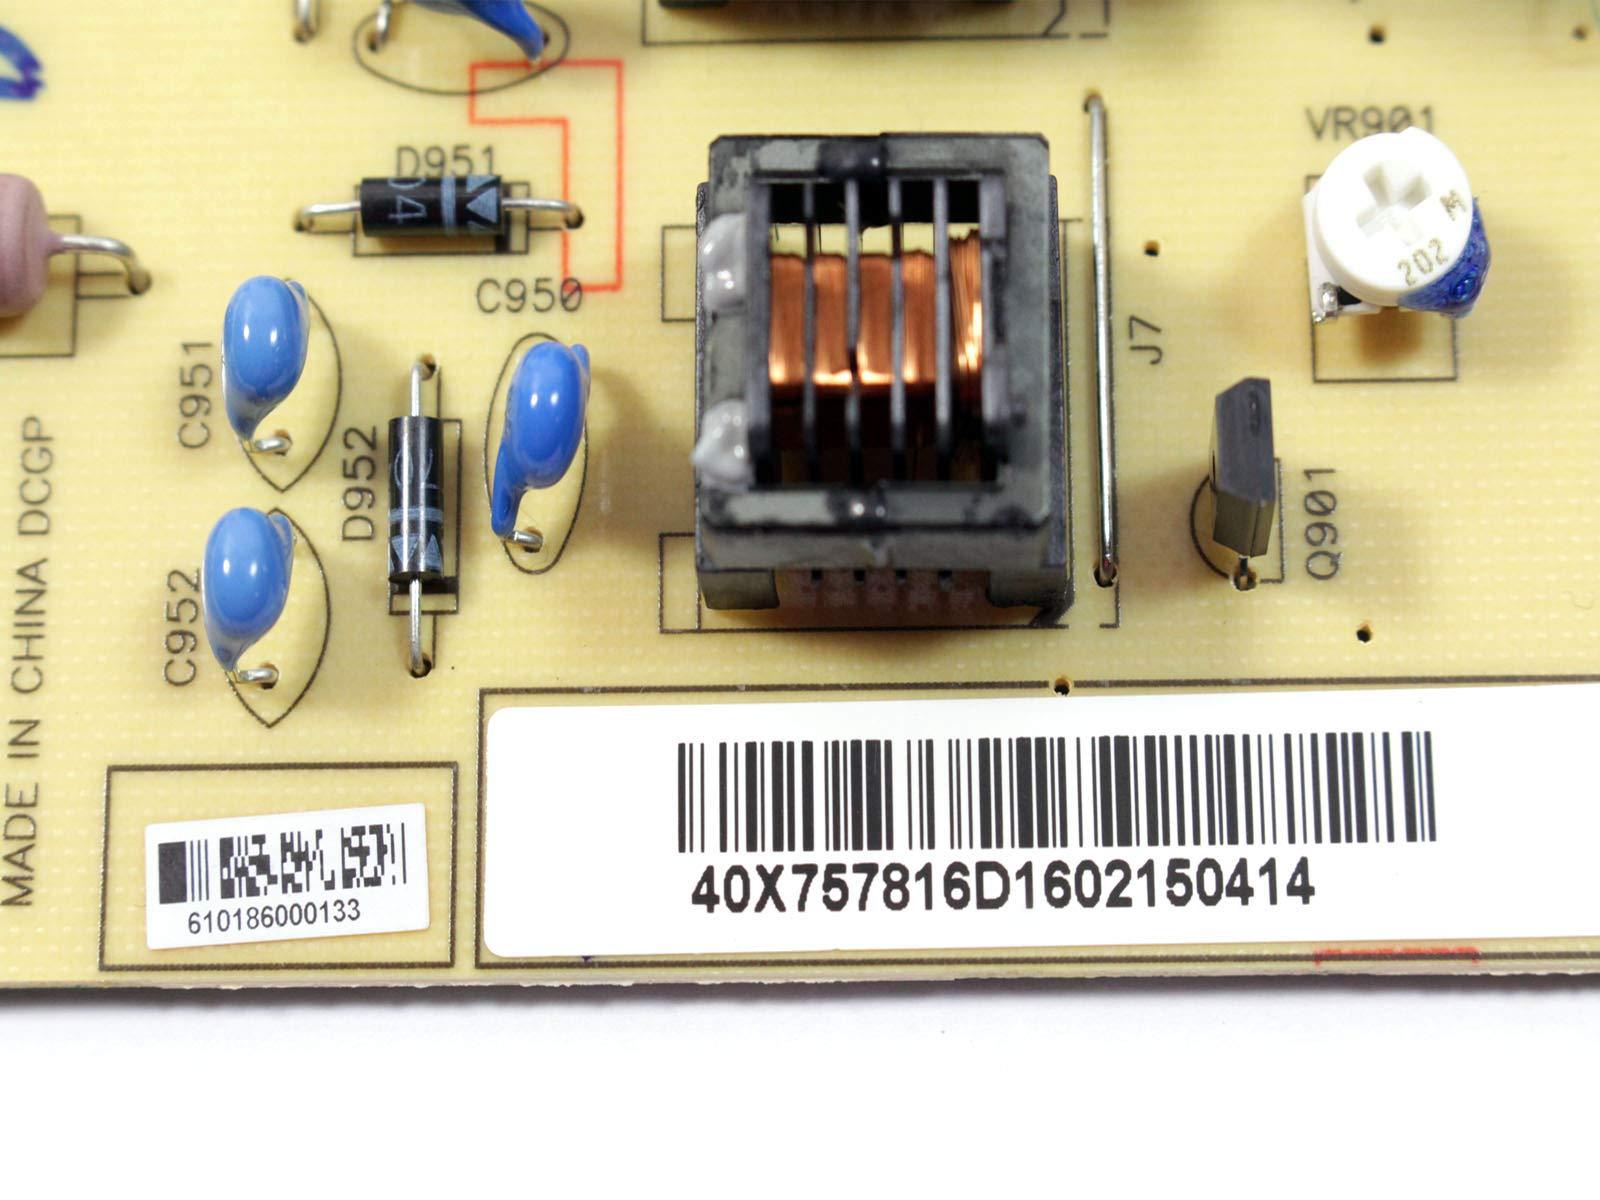 EbidDealz Genuine Power Supply Circuit Card Board EDPS-1BF A for Laser Printer B5460 B5465 B5465DNF & MS812de 6WT1V 06WT1V by EbidDealz (Image #2)